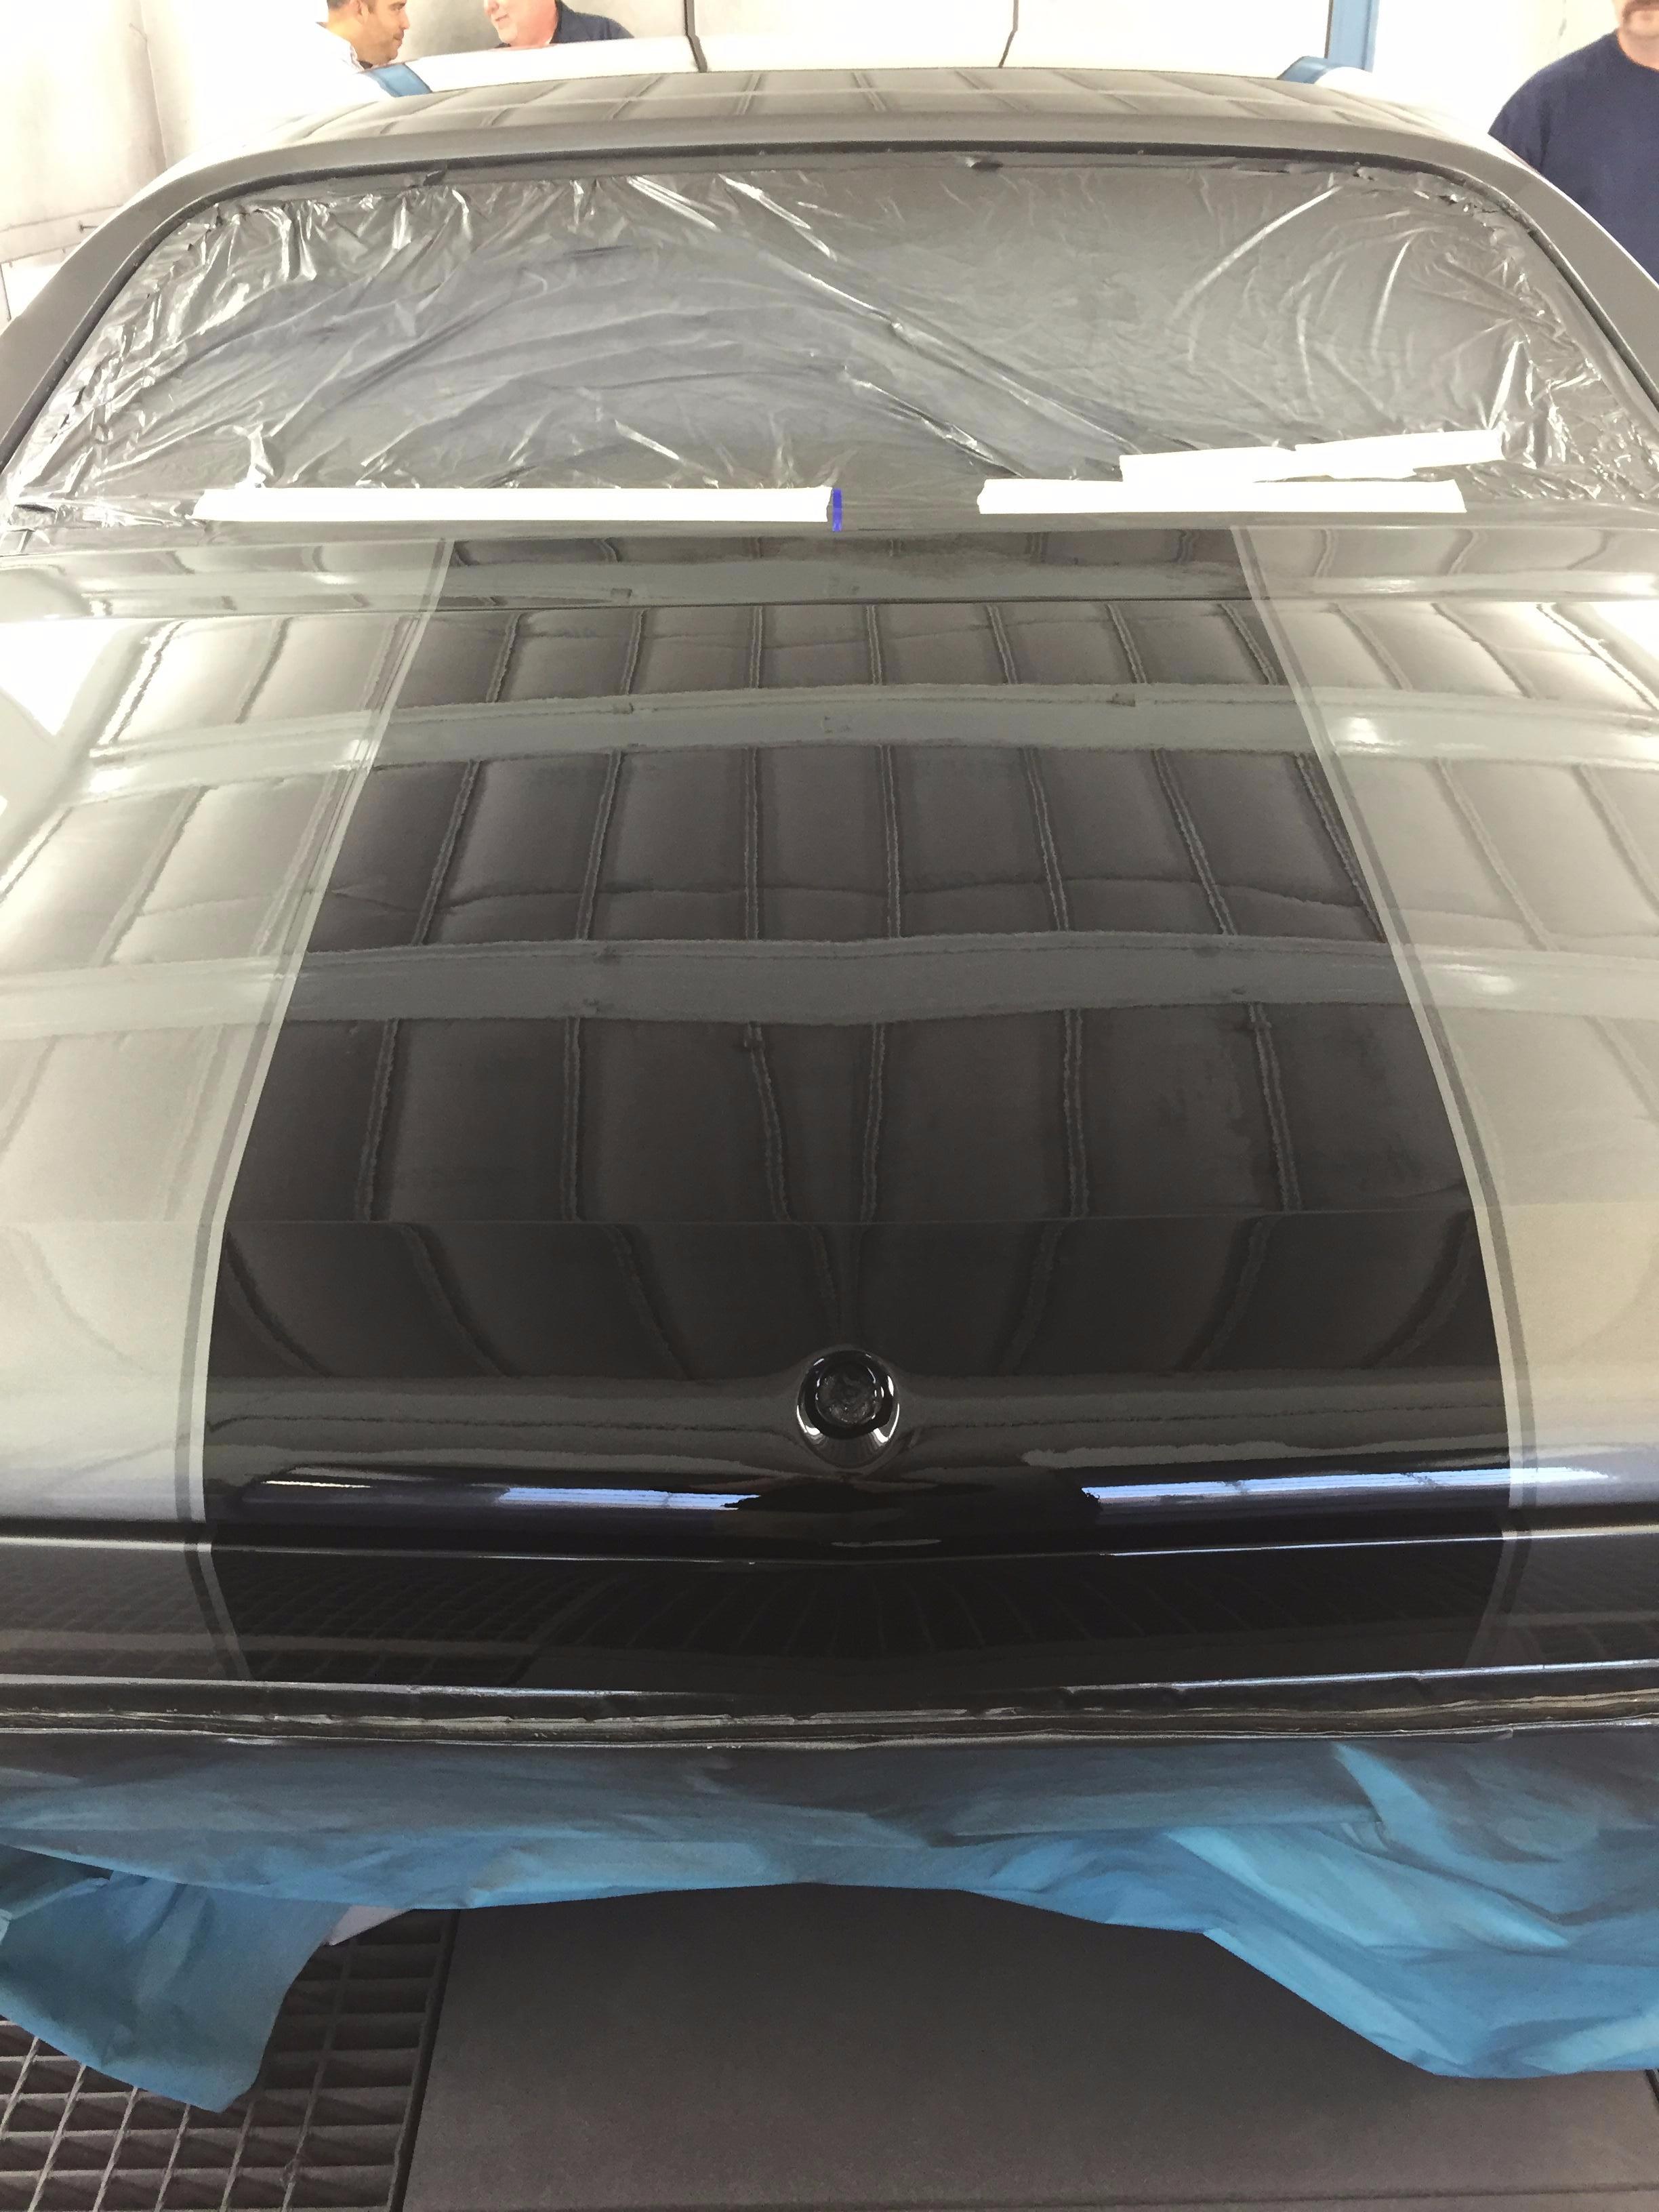 Maaco Collision Repair & Auto Painting image 6